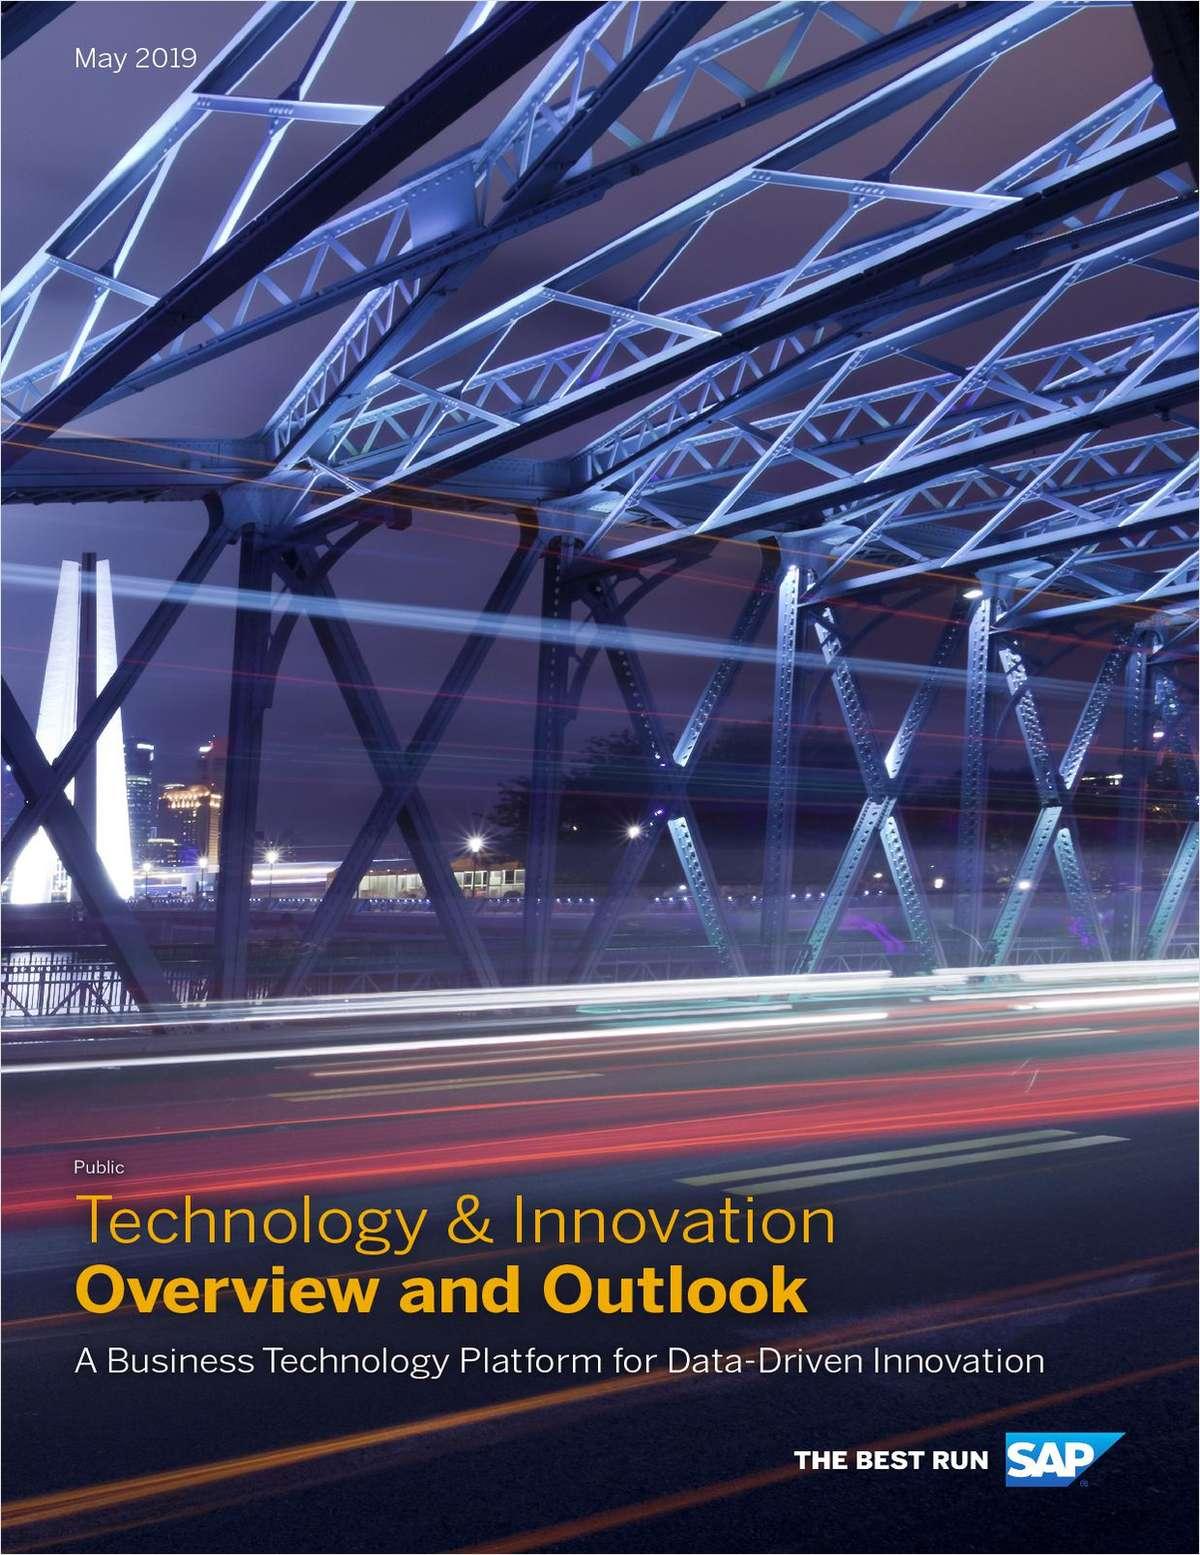 A Business Technology Platform for Data-Driven Innovation